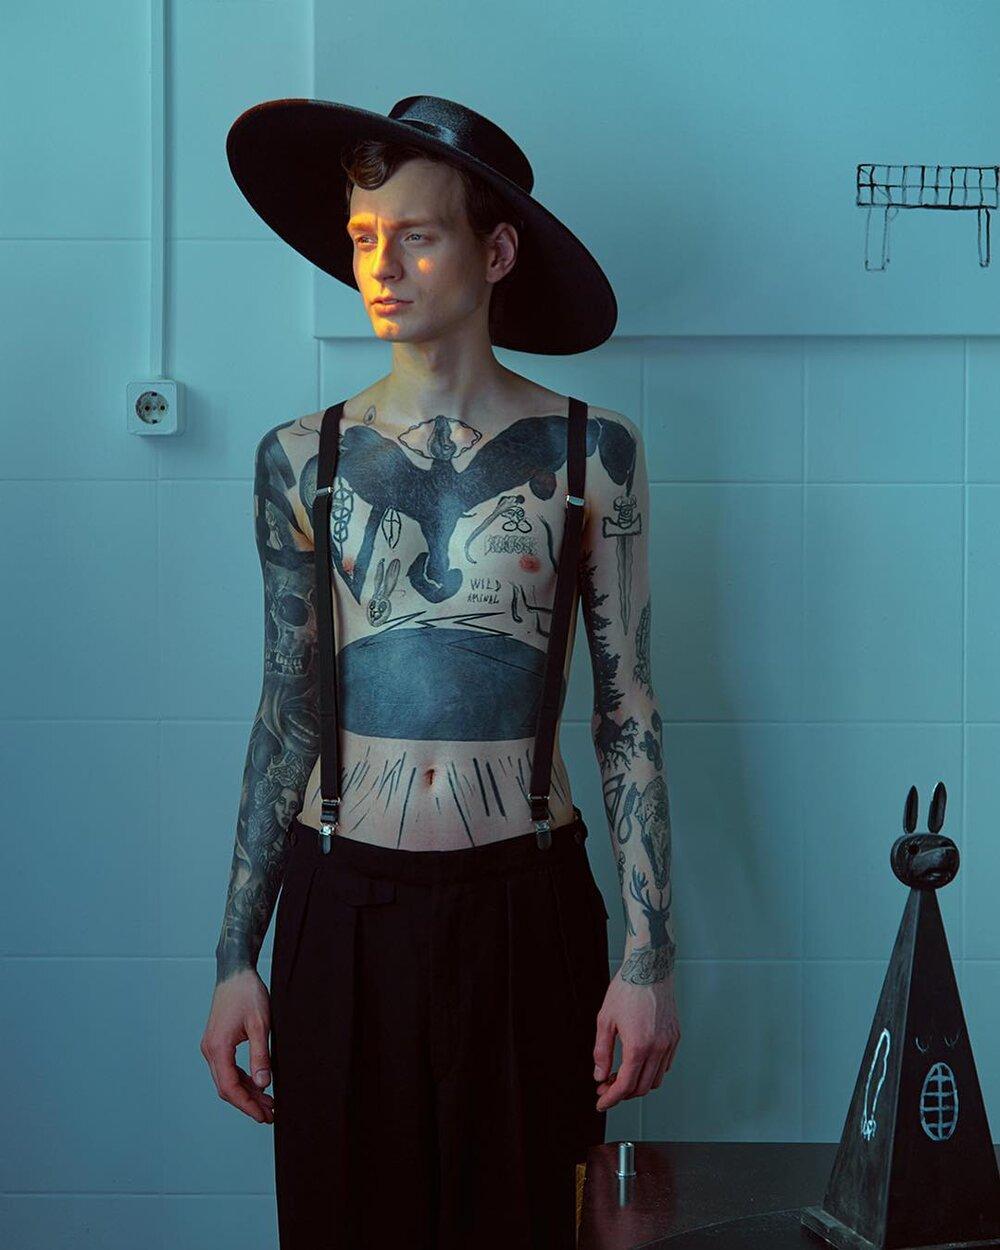 ilia-zharkov-tattoos.jpeg